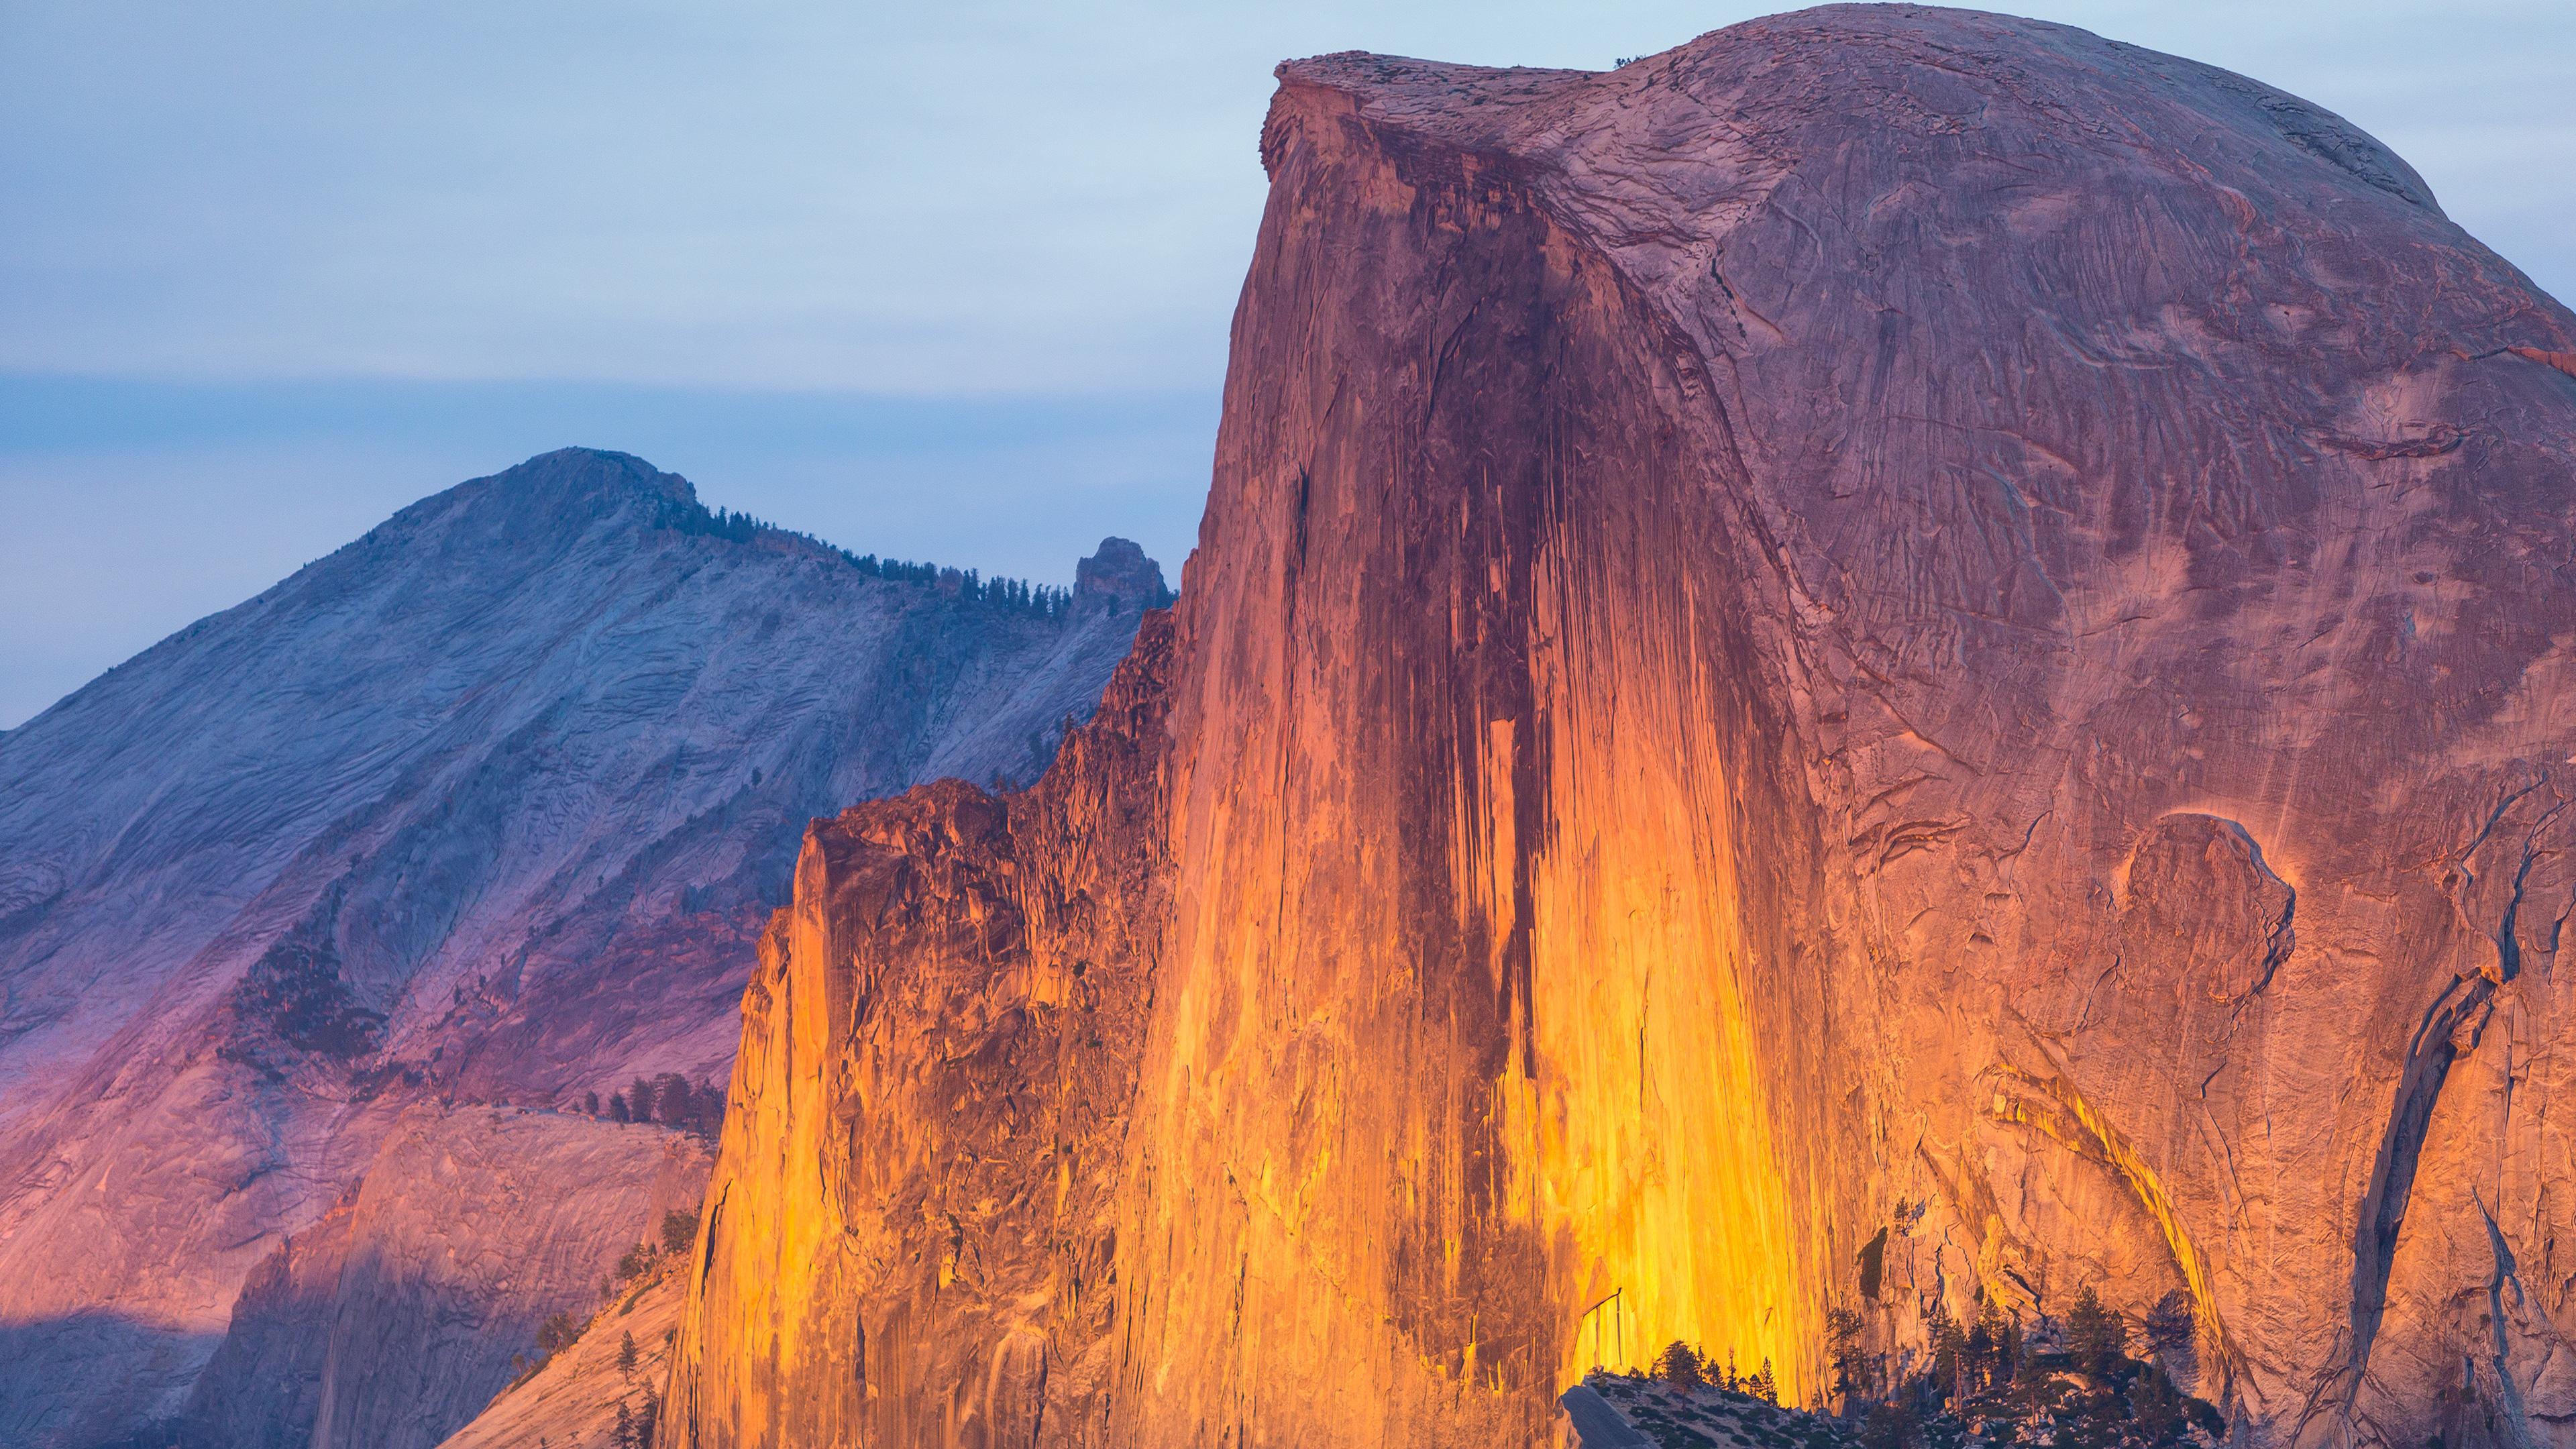 Yosemite Sun Rays 4k Hd Nature 4k Wallpapers Images